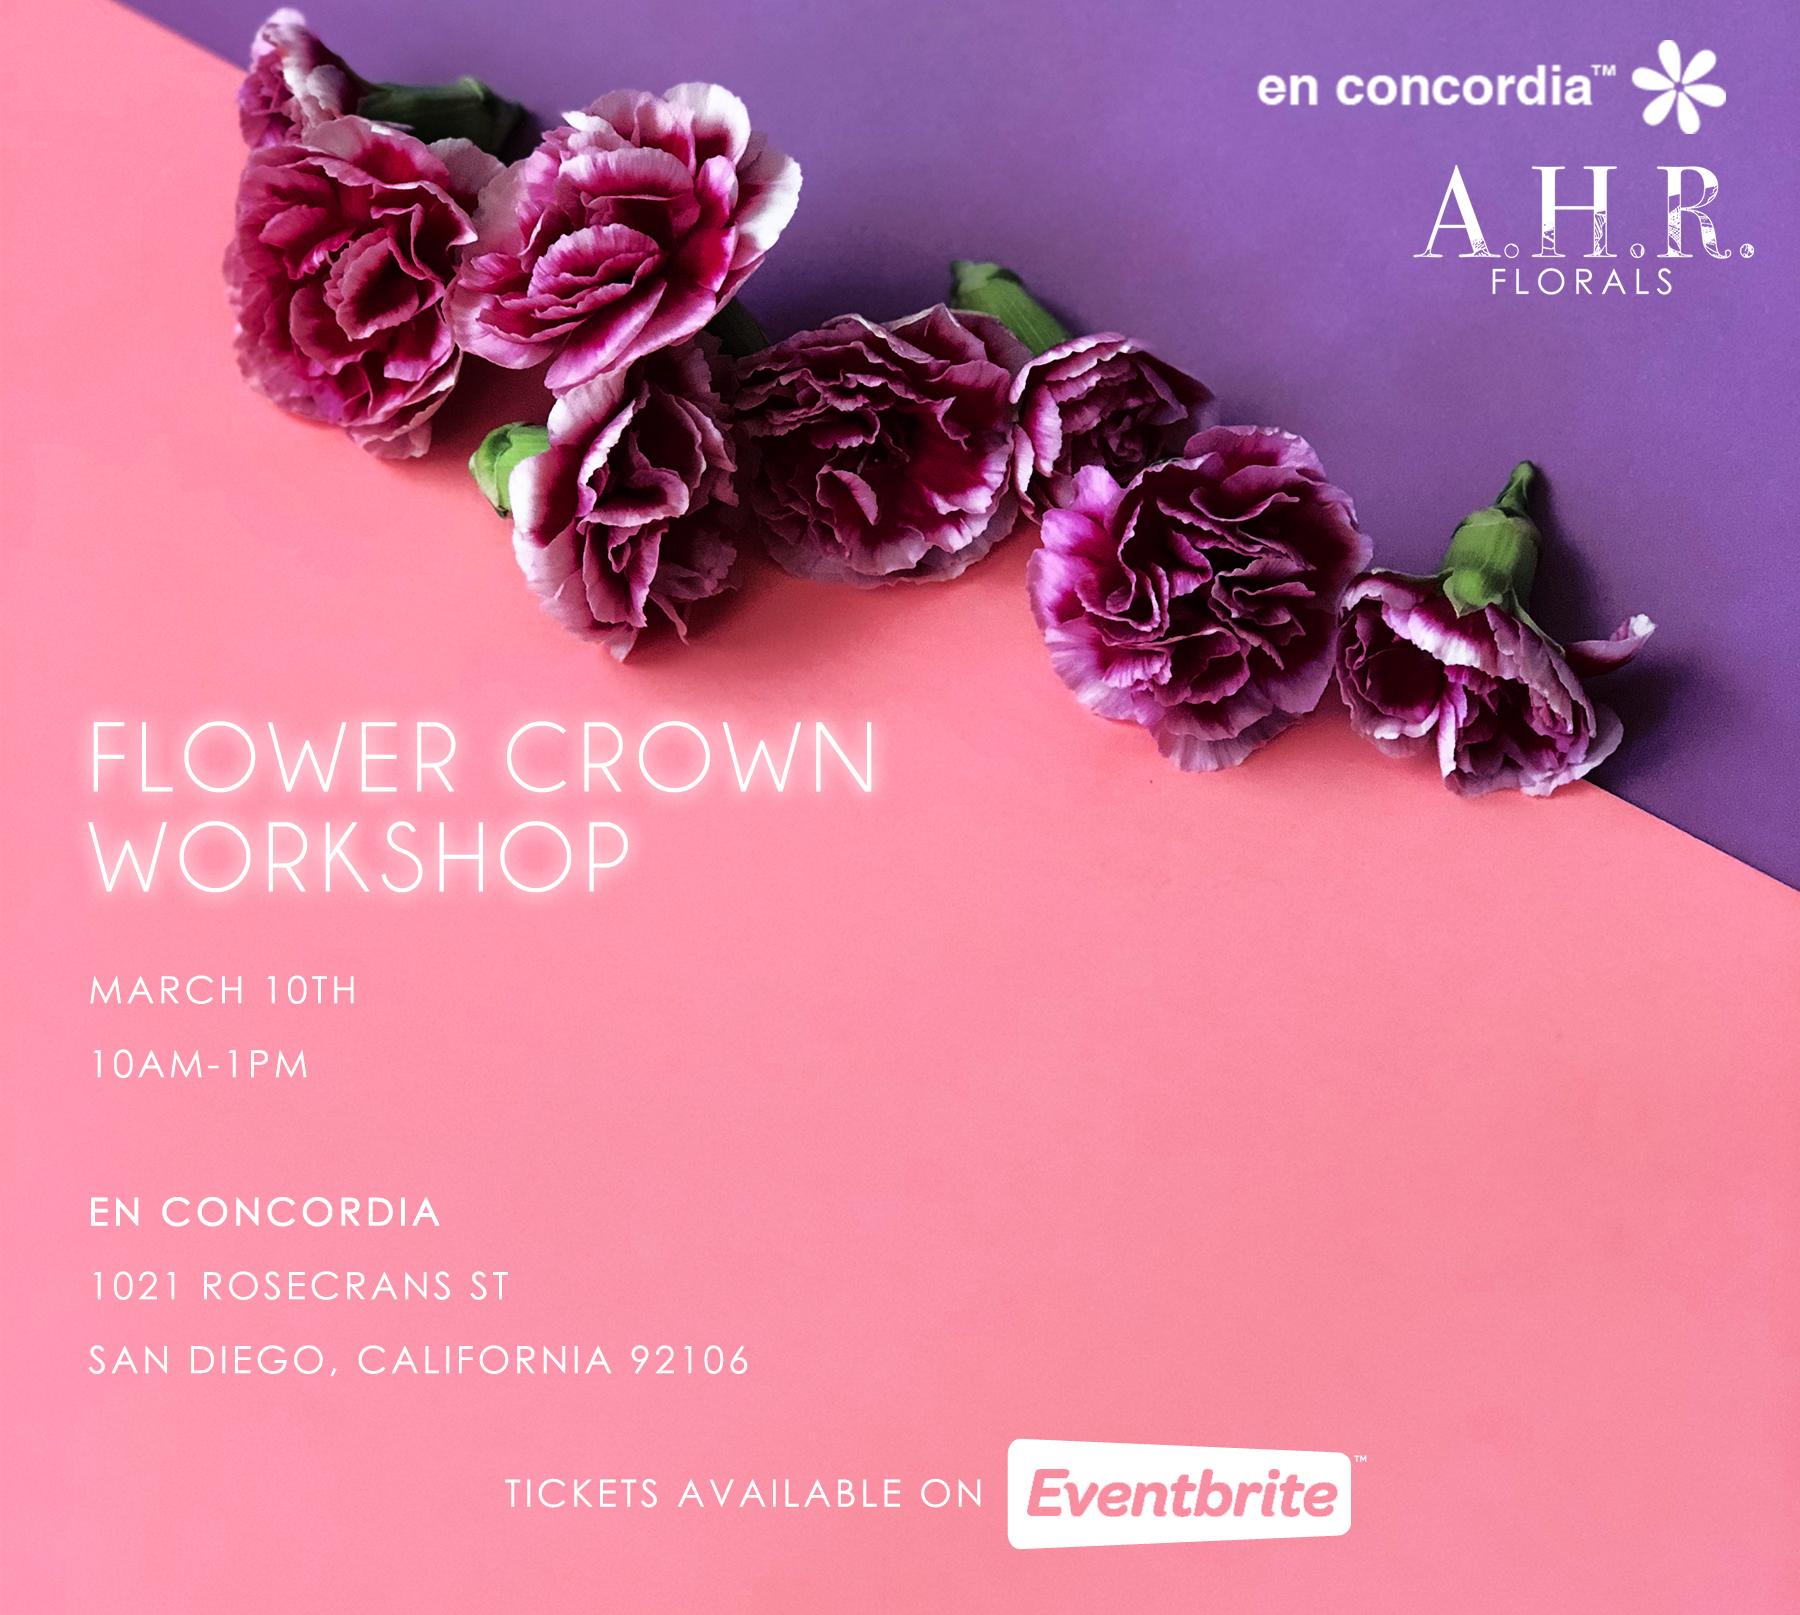 ahr florals en concordia flower crown workshop san diego